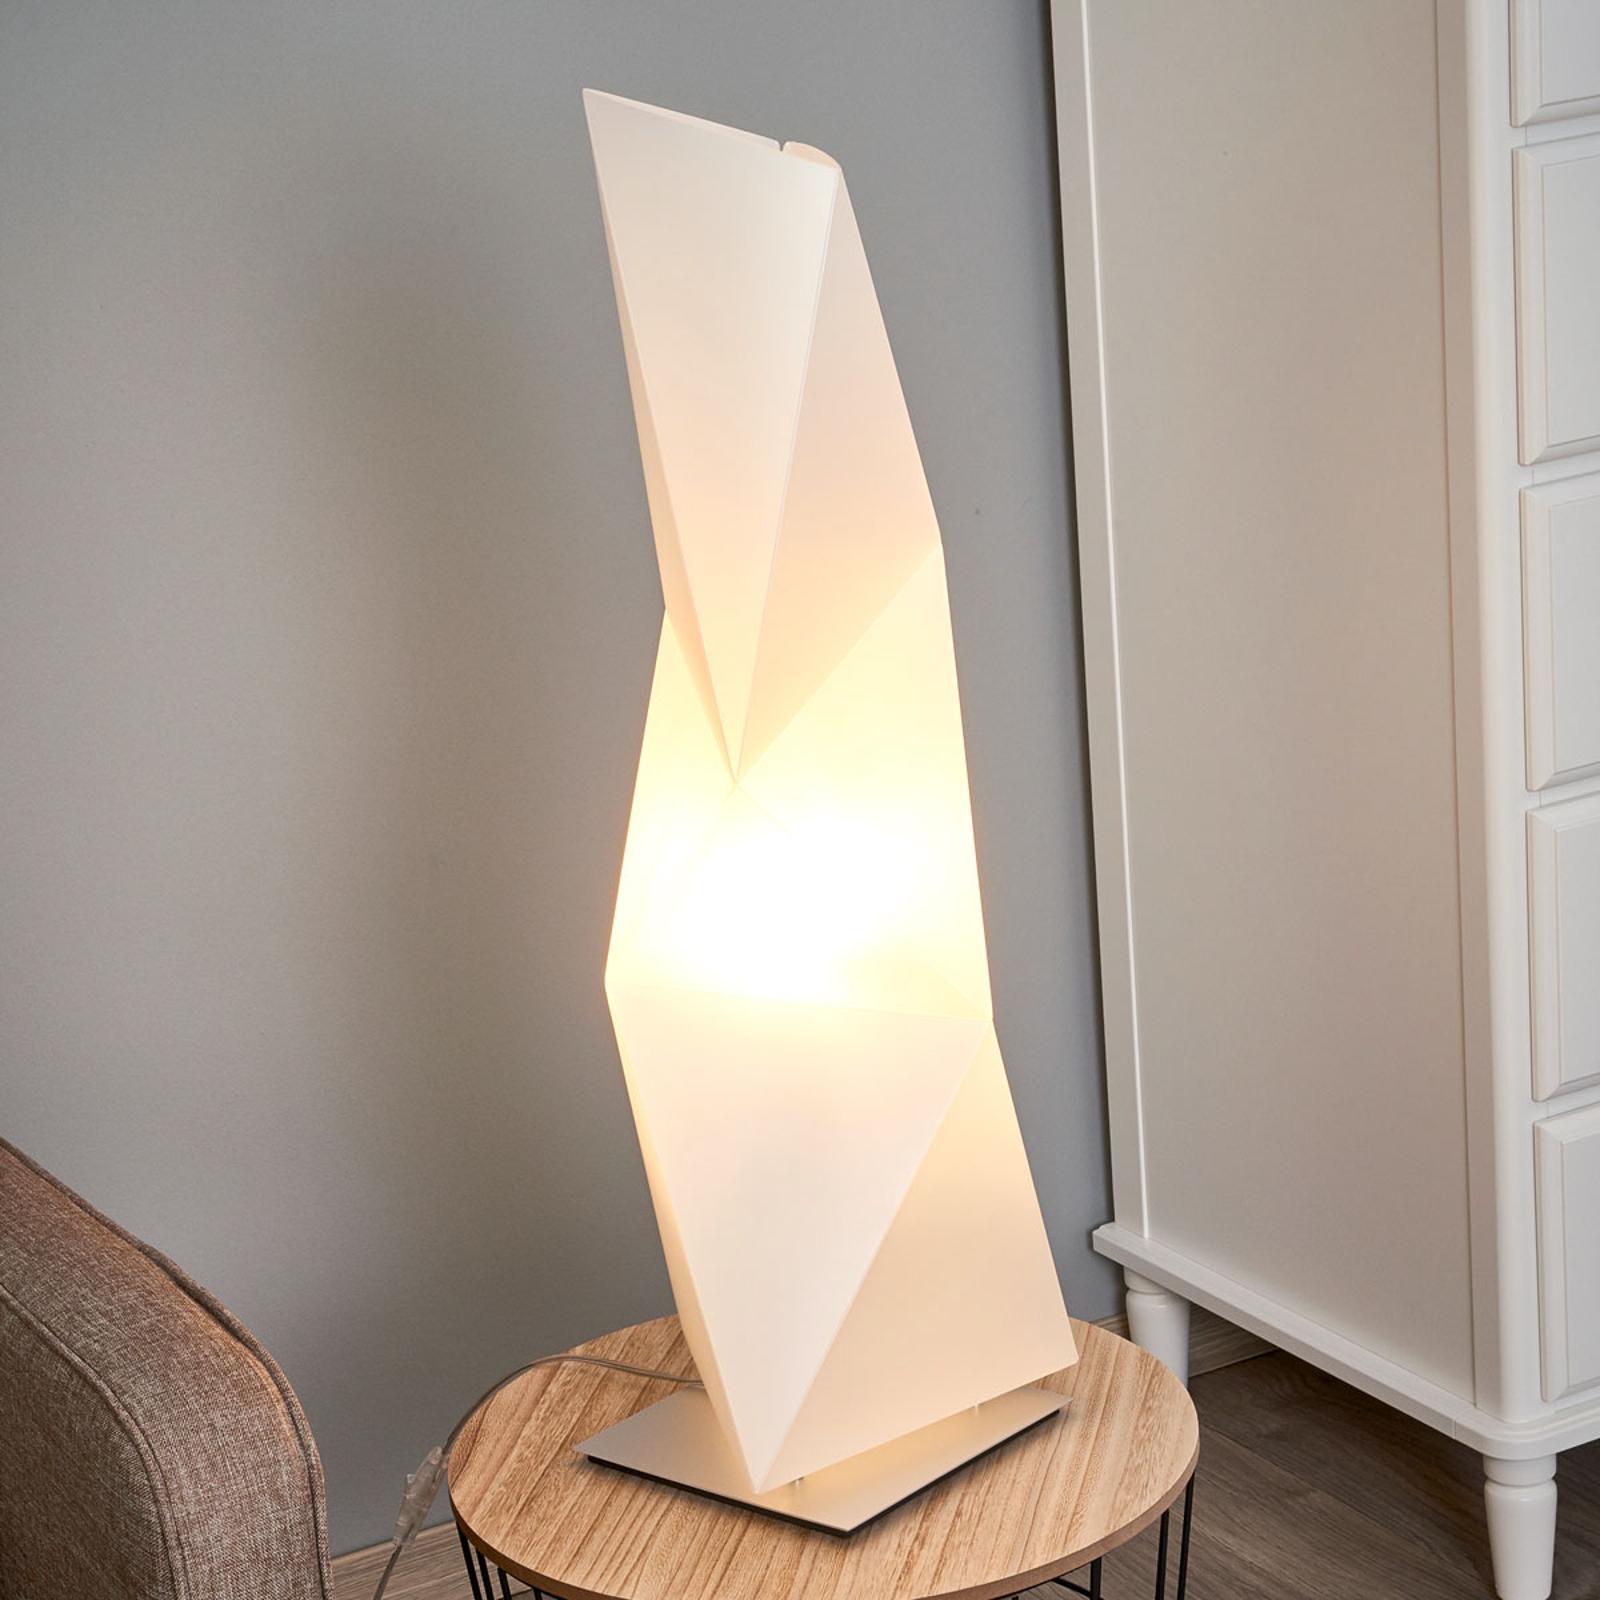 Kantig designer-bordslampa Diamond 72 cm